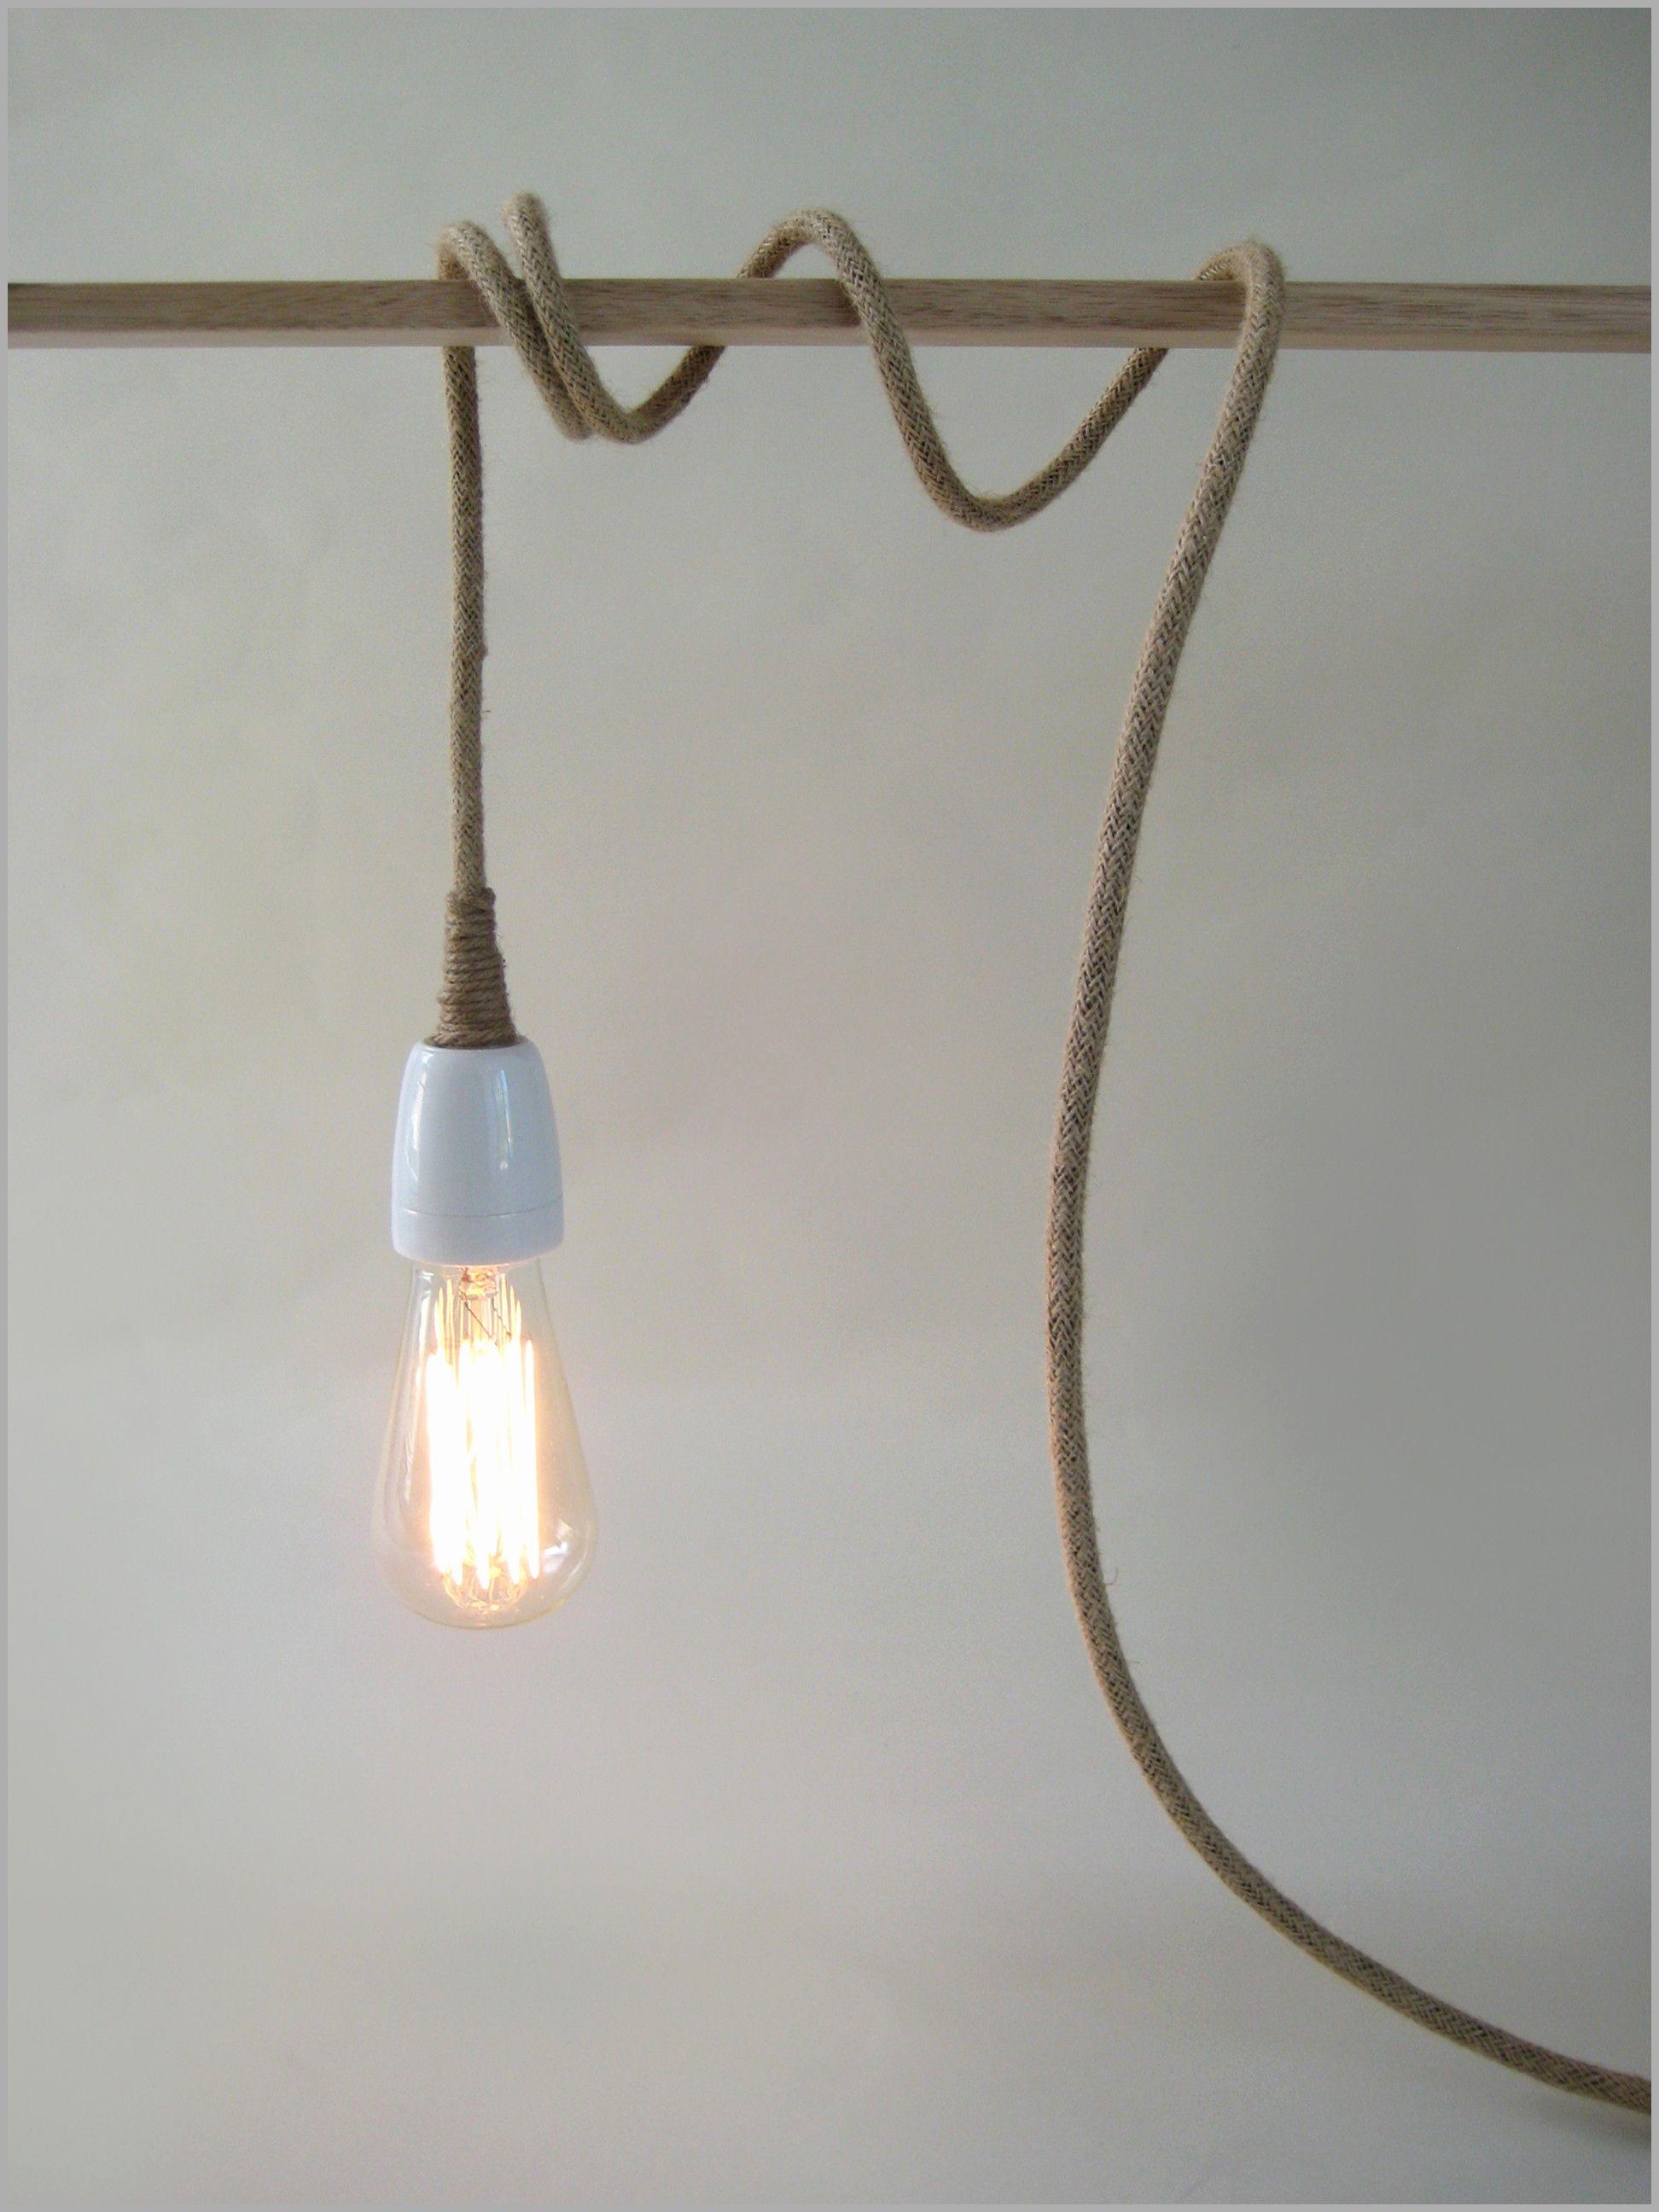 Dining Room Plug In Pendant Light Lighting Design Lights That 27 From Plug In Pendant Light Plug In Pendant Light Rustic Pendant Lighting Pendant Light Cord